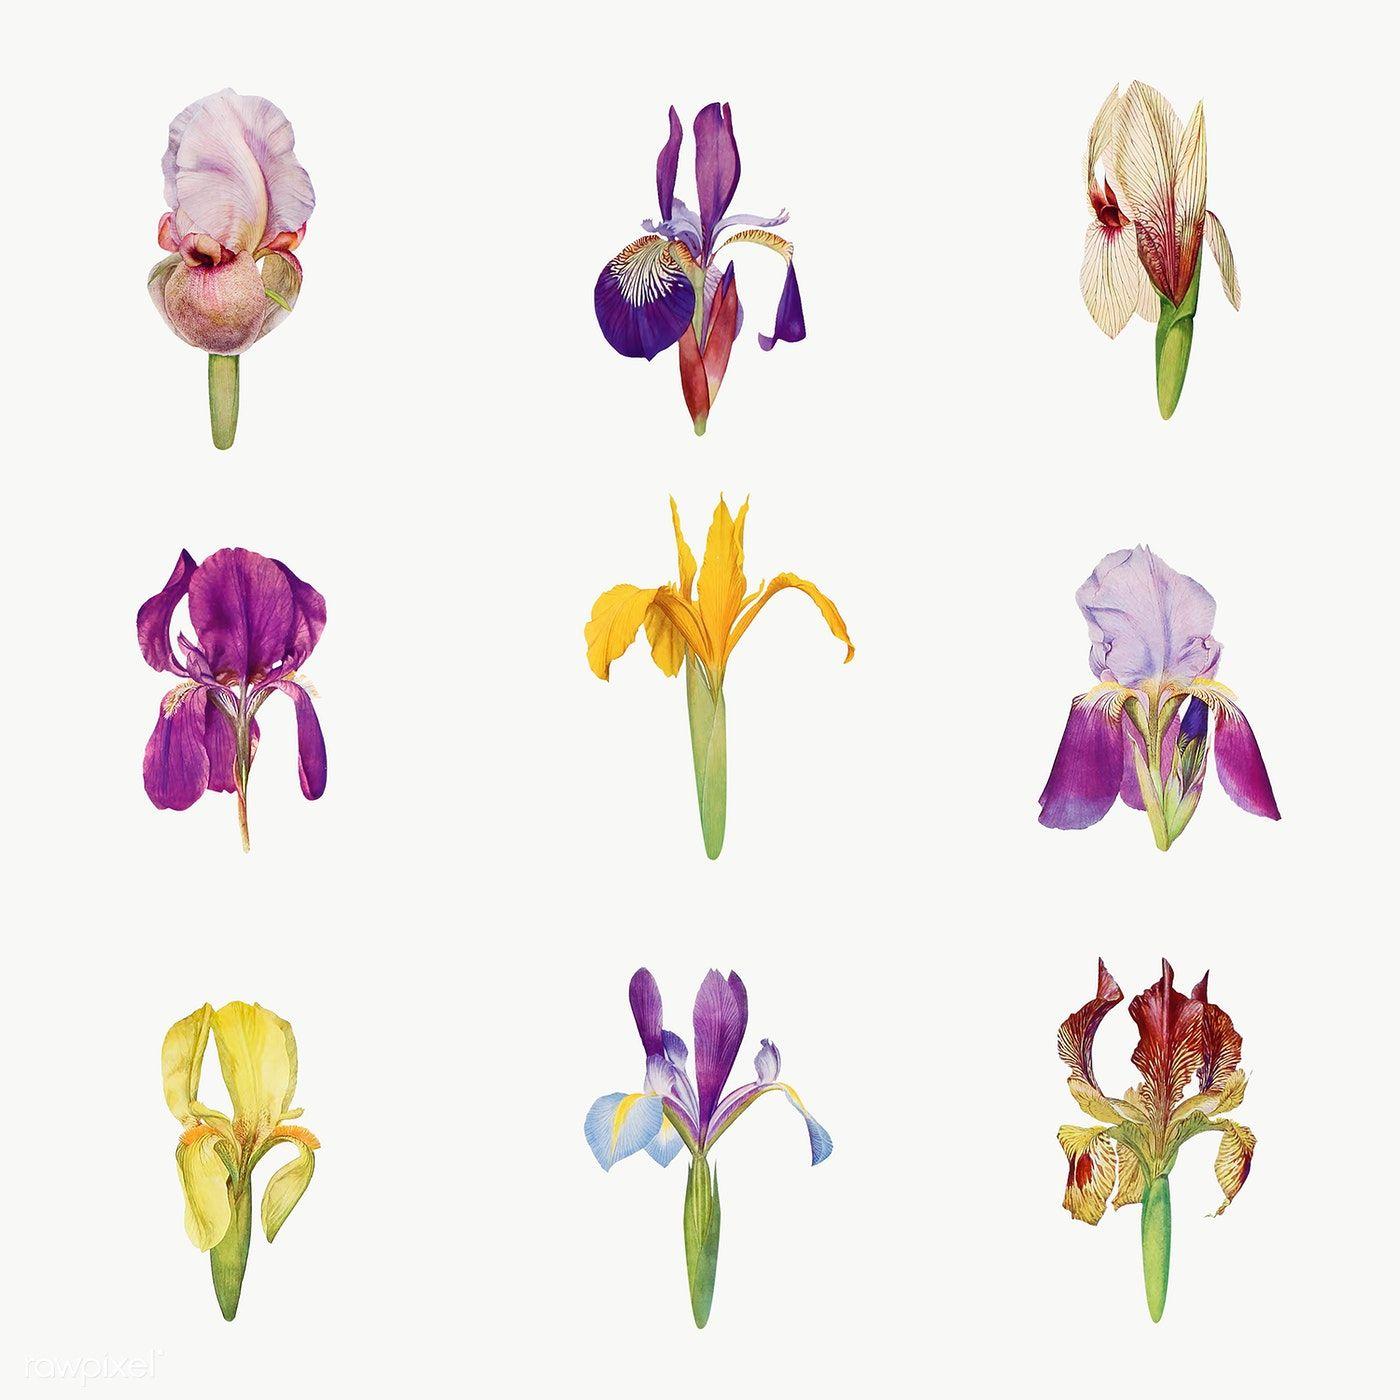 Download Premium Png Of Vintage Iris Flower Illustrations Collection Flower Illustration Iris Flowers Flower Drawing